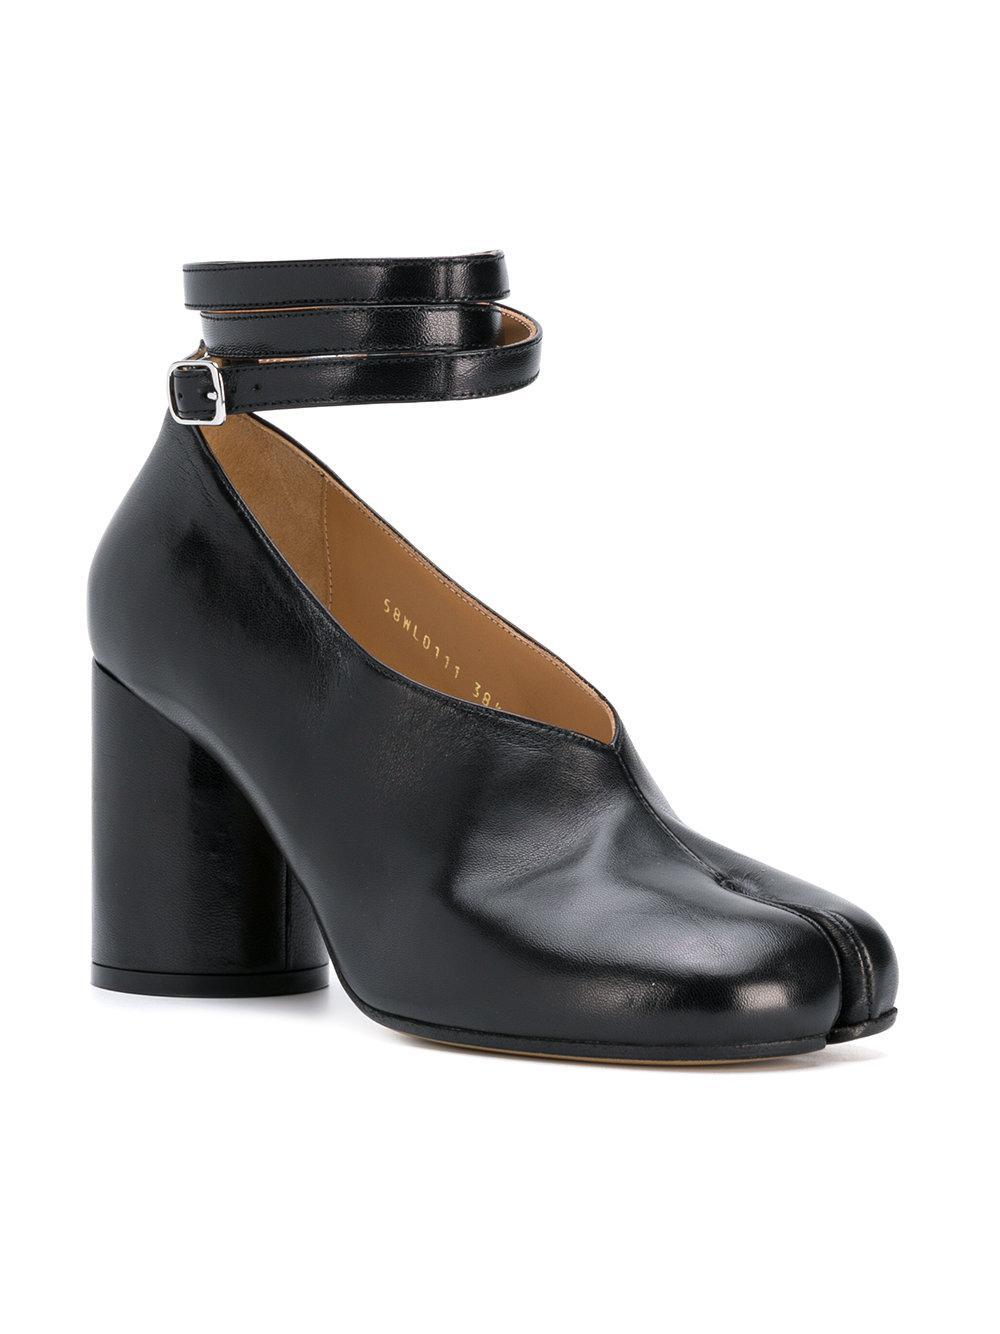 f81aa0f1fa73 Lyst - Maison Margiela New Mary Jane Pumps in Black - Save 37%